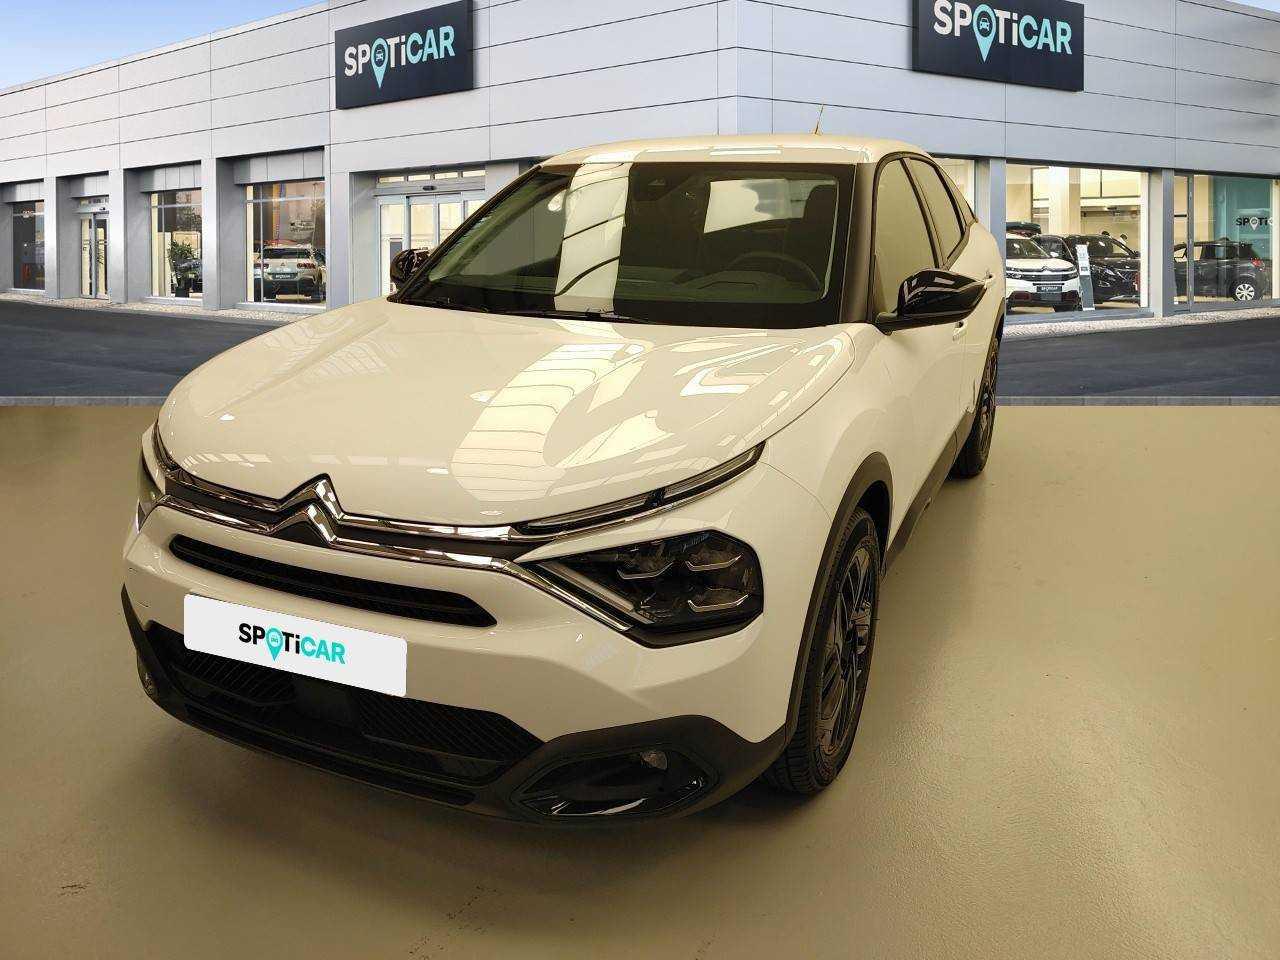 Citroën C4 ocasión segunda mano 2021 Diésel por 23.500€ en Sevilla